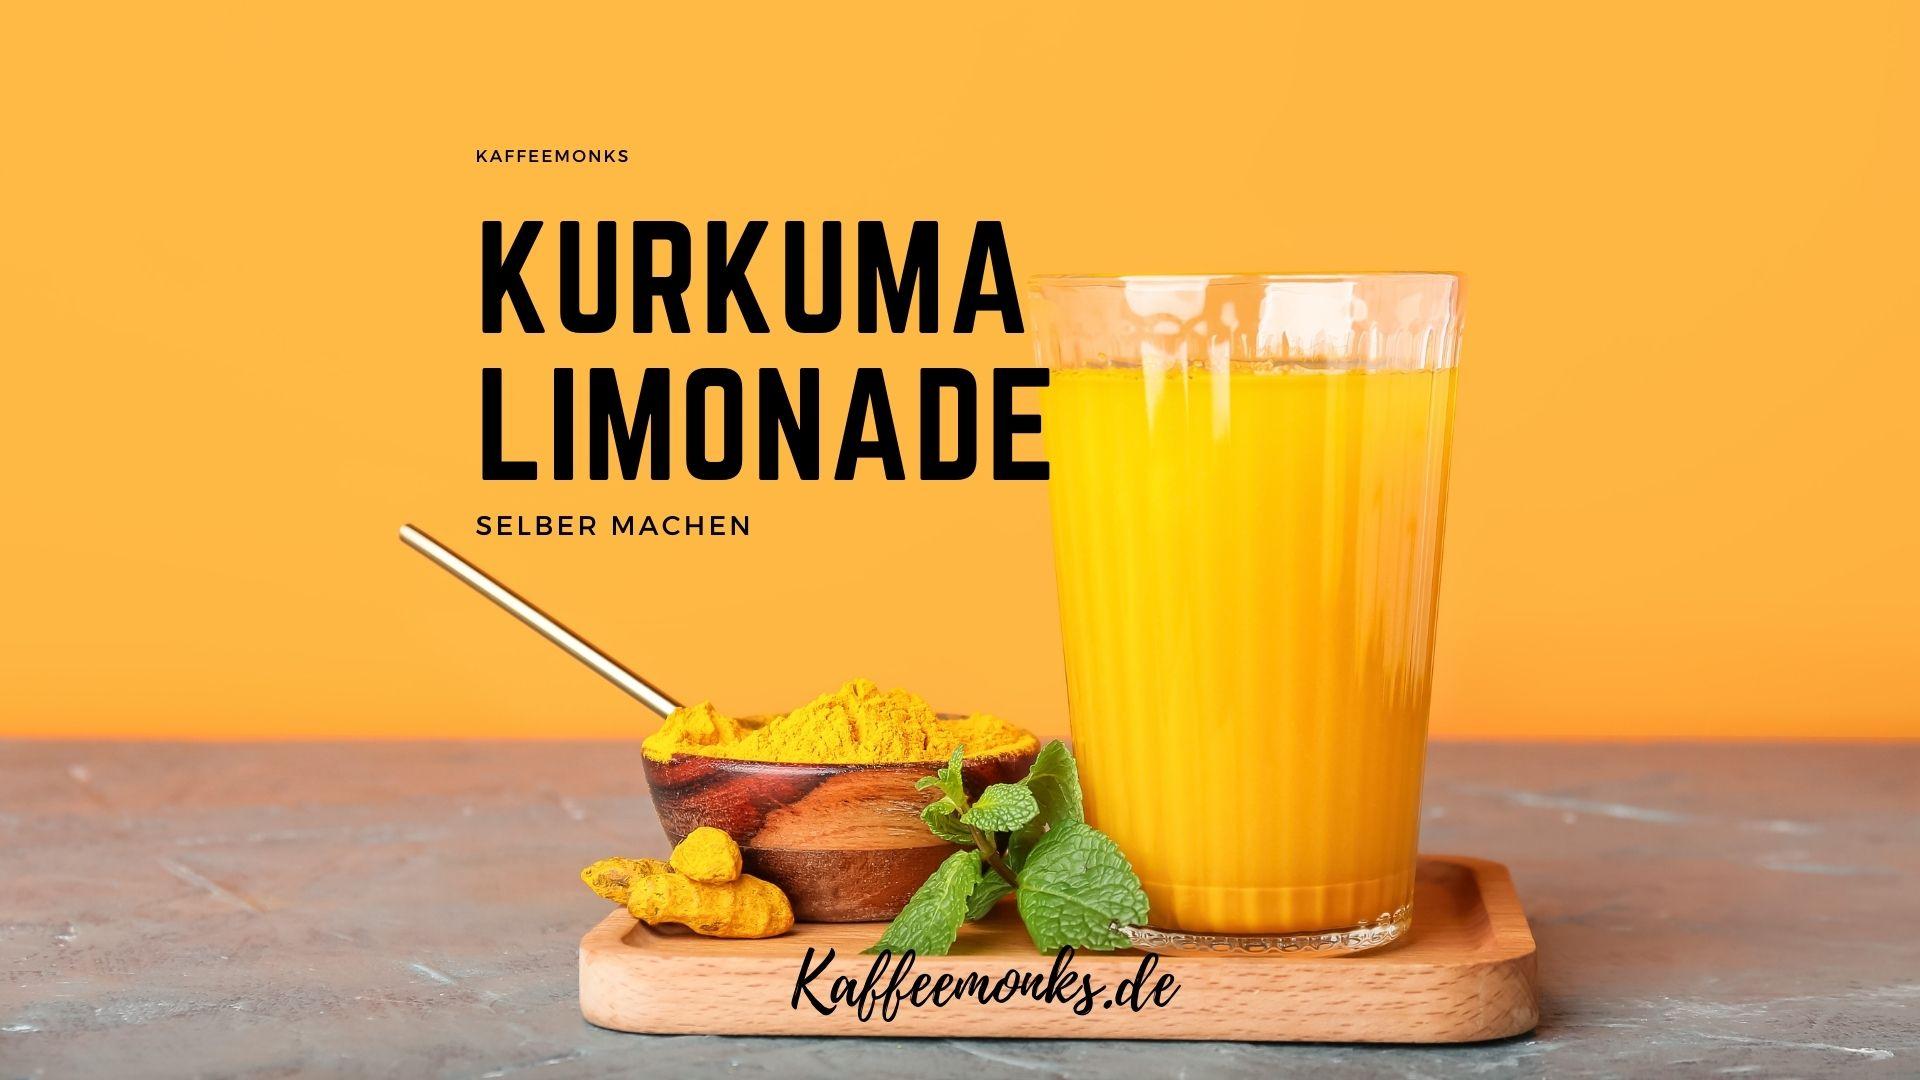 You are currently viewing KURKUMA LIMONADE: DAS GENIALE SUPERFOOD ALS GETRÄNK